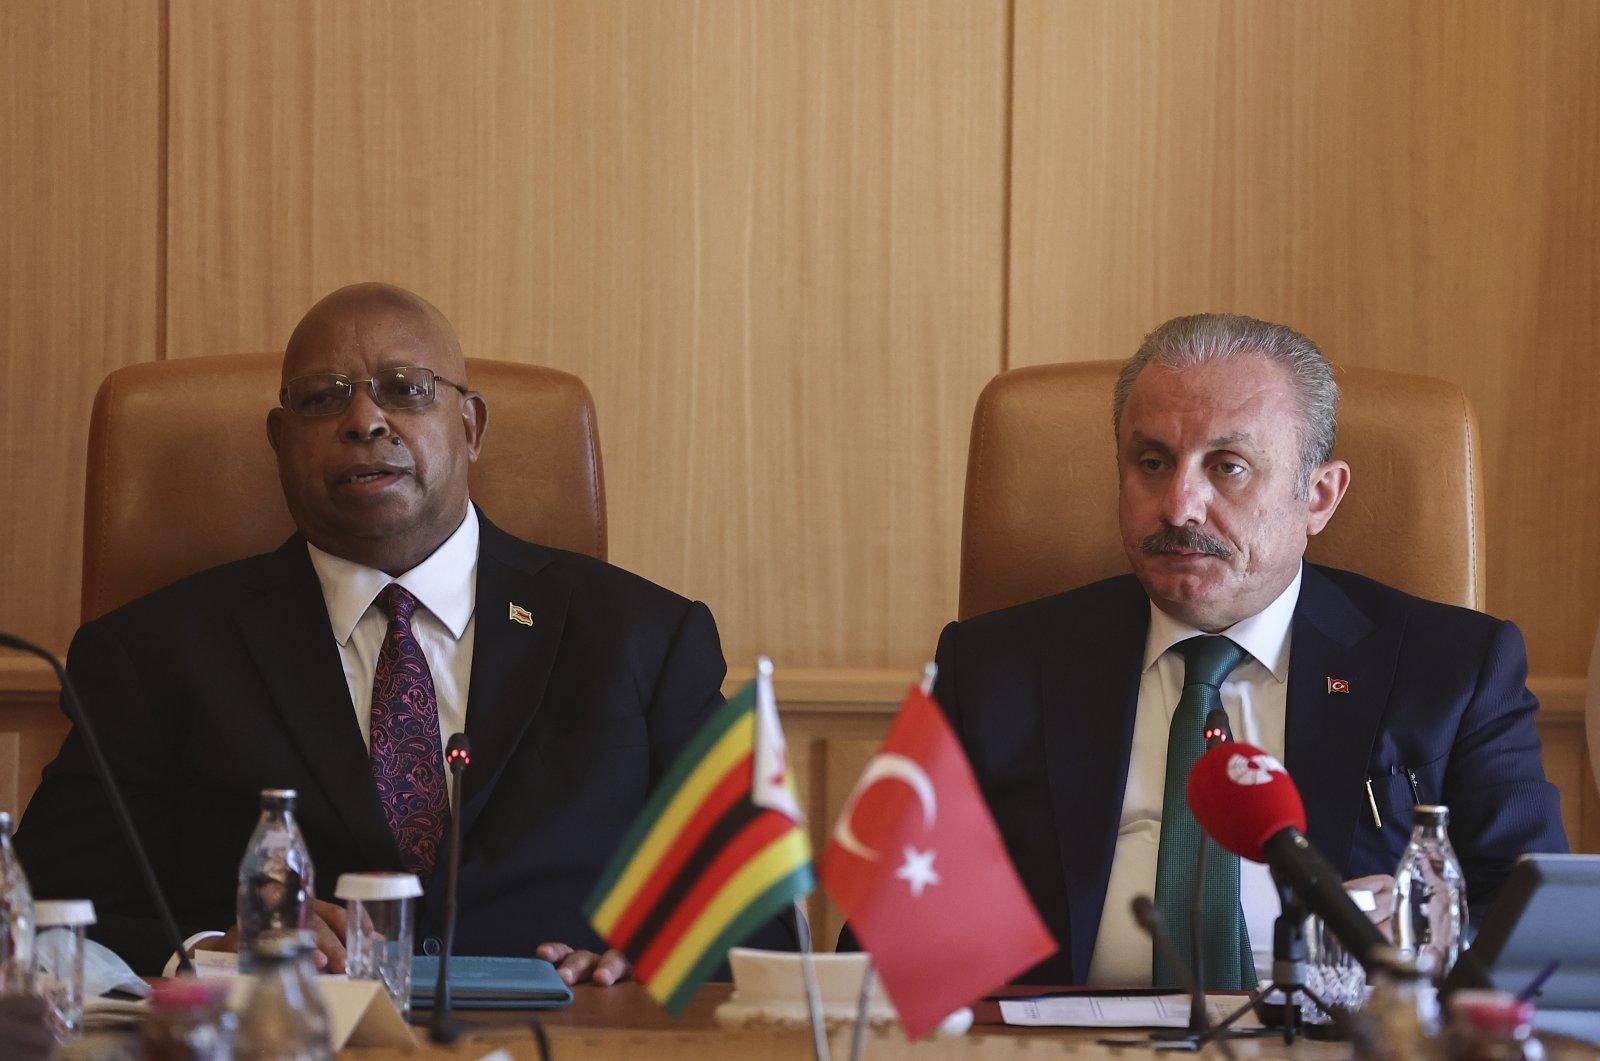 Turkish Parliament Speaker Mustafa Şentop (R) together with his Zimbabwean counterpart Jacob Francis Mudenda in Ankara, July 5, 2021 (AA Photo)